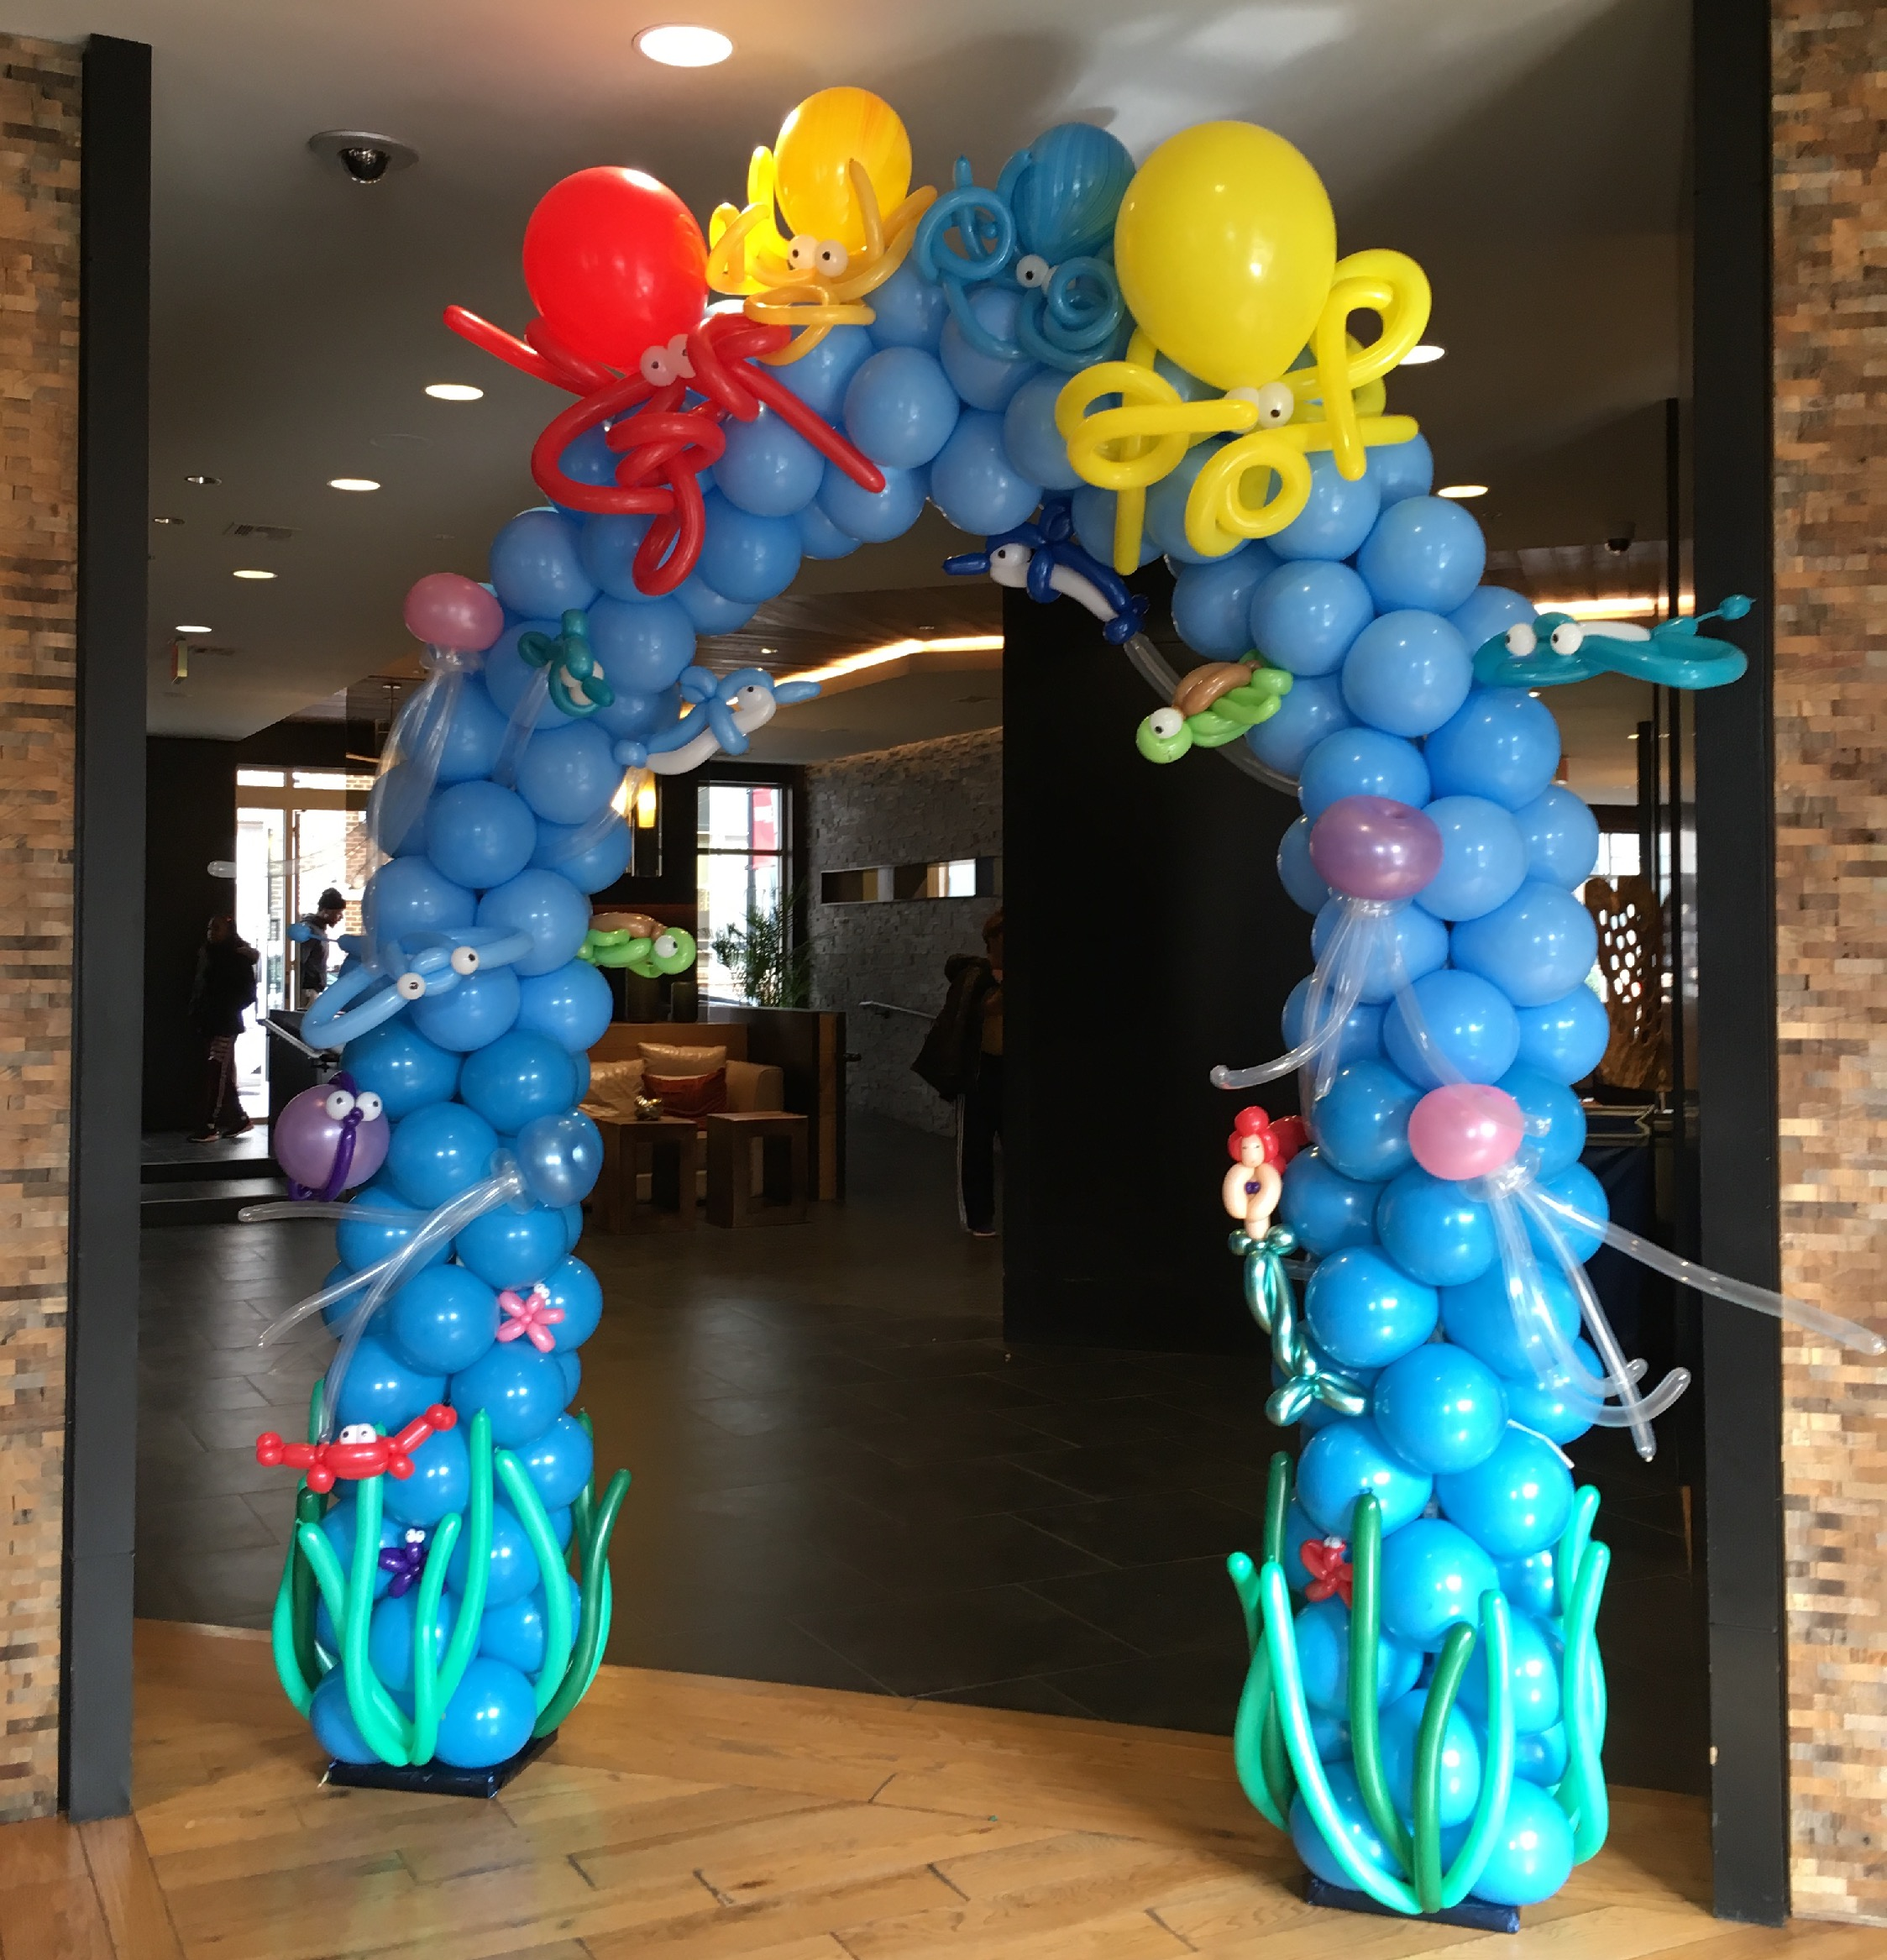 Under The Sea Balloon Arch   Washington DC   Balloon Zoom